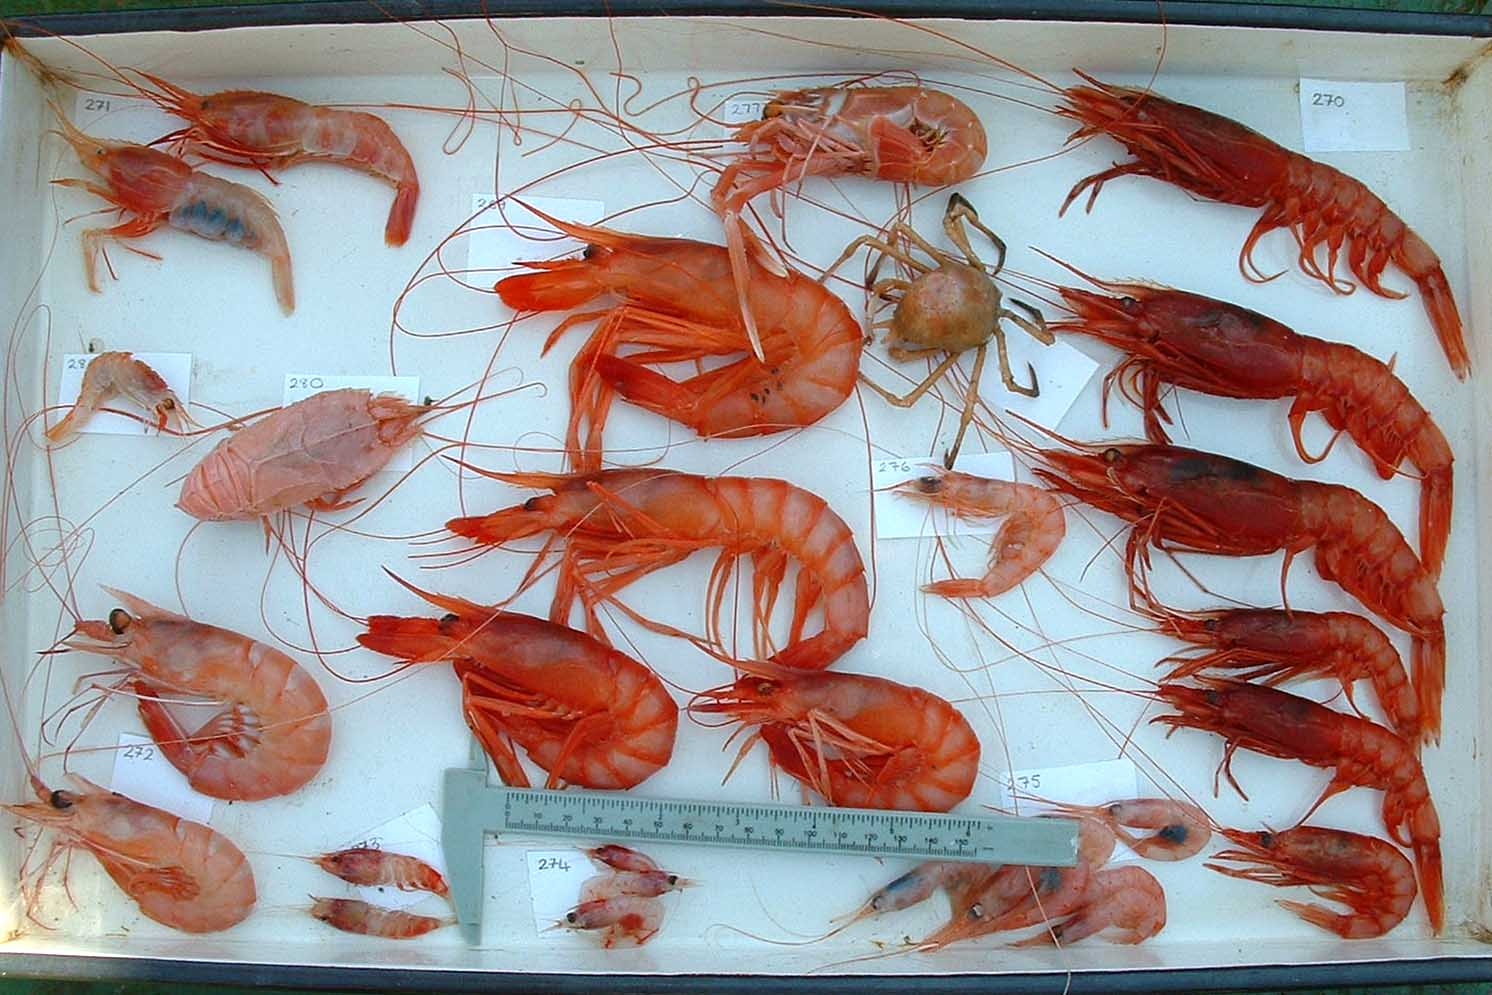 uThukela Bank supports a diversity of crustaceans (ACEP)